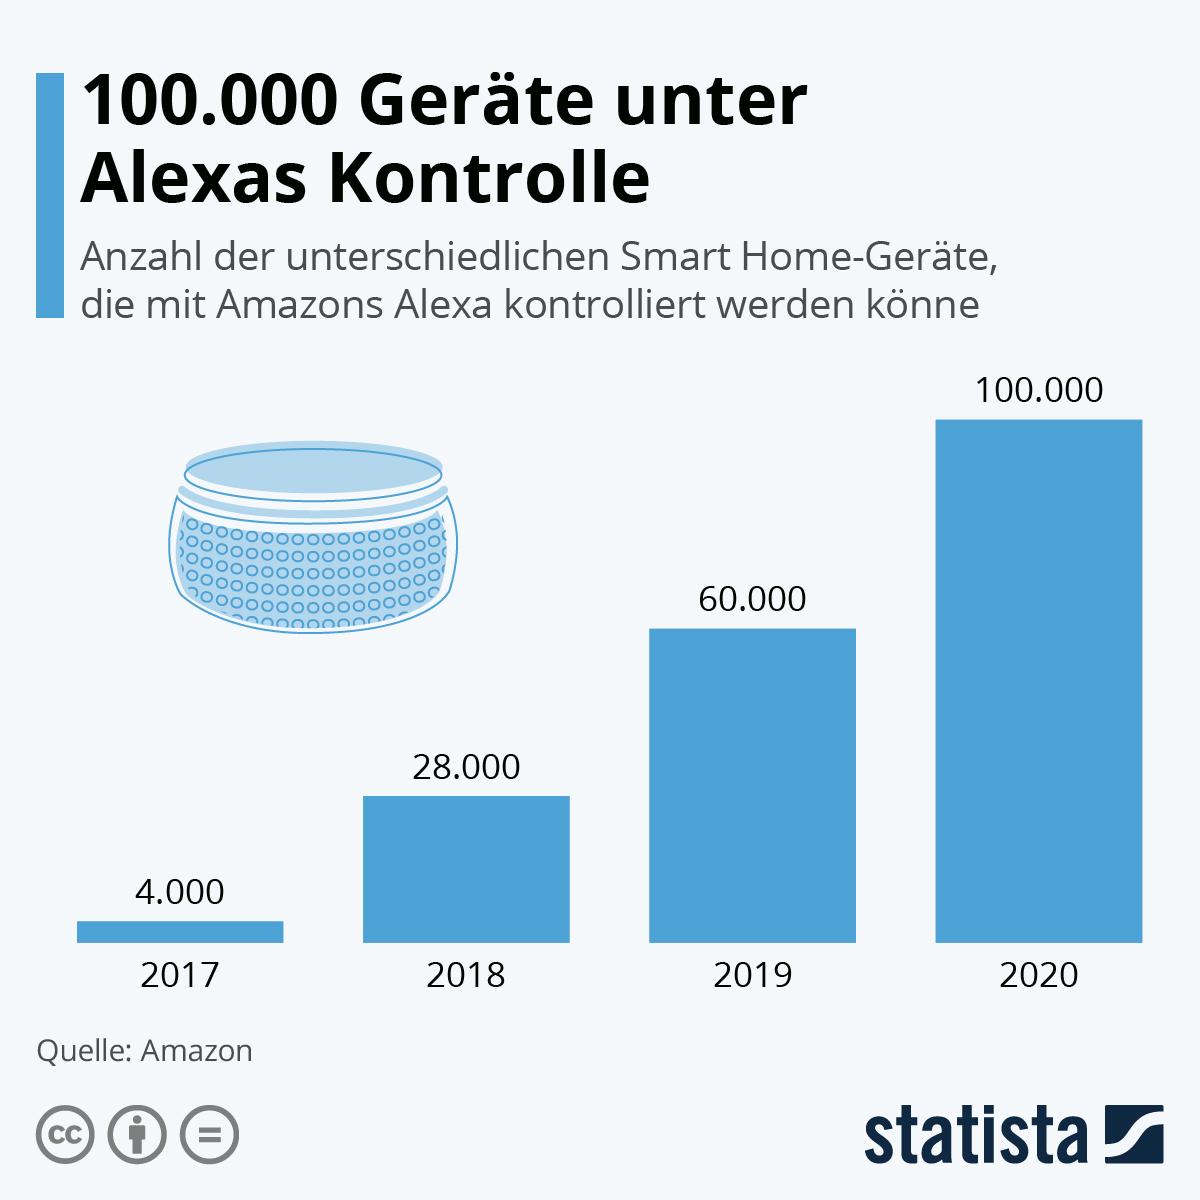 Infografik: 100.000 Geräte unter Alexas Kontrolle | Statista